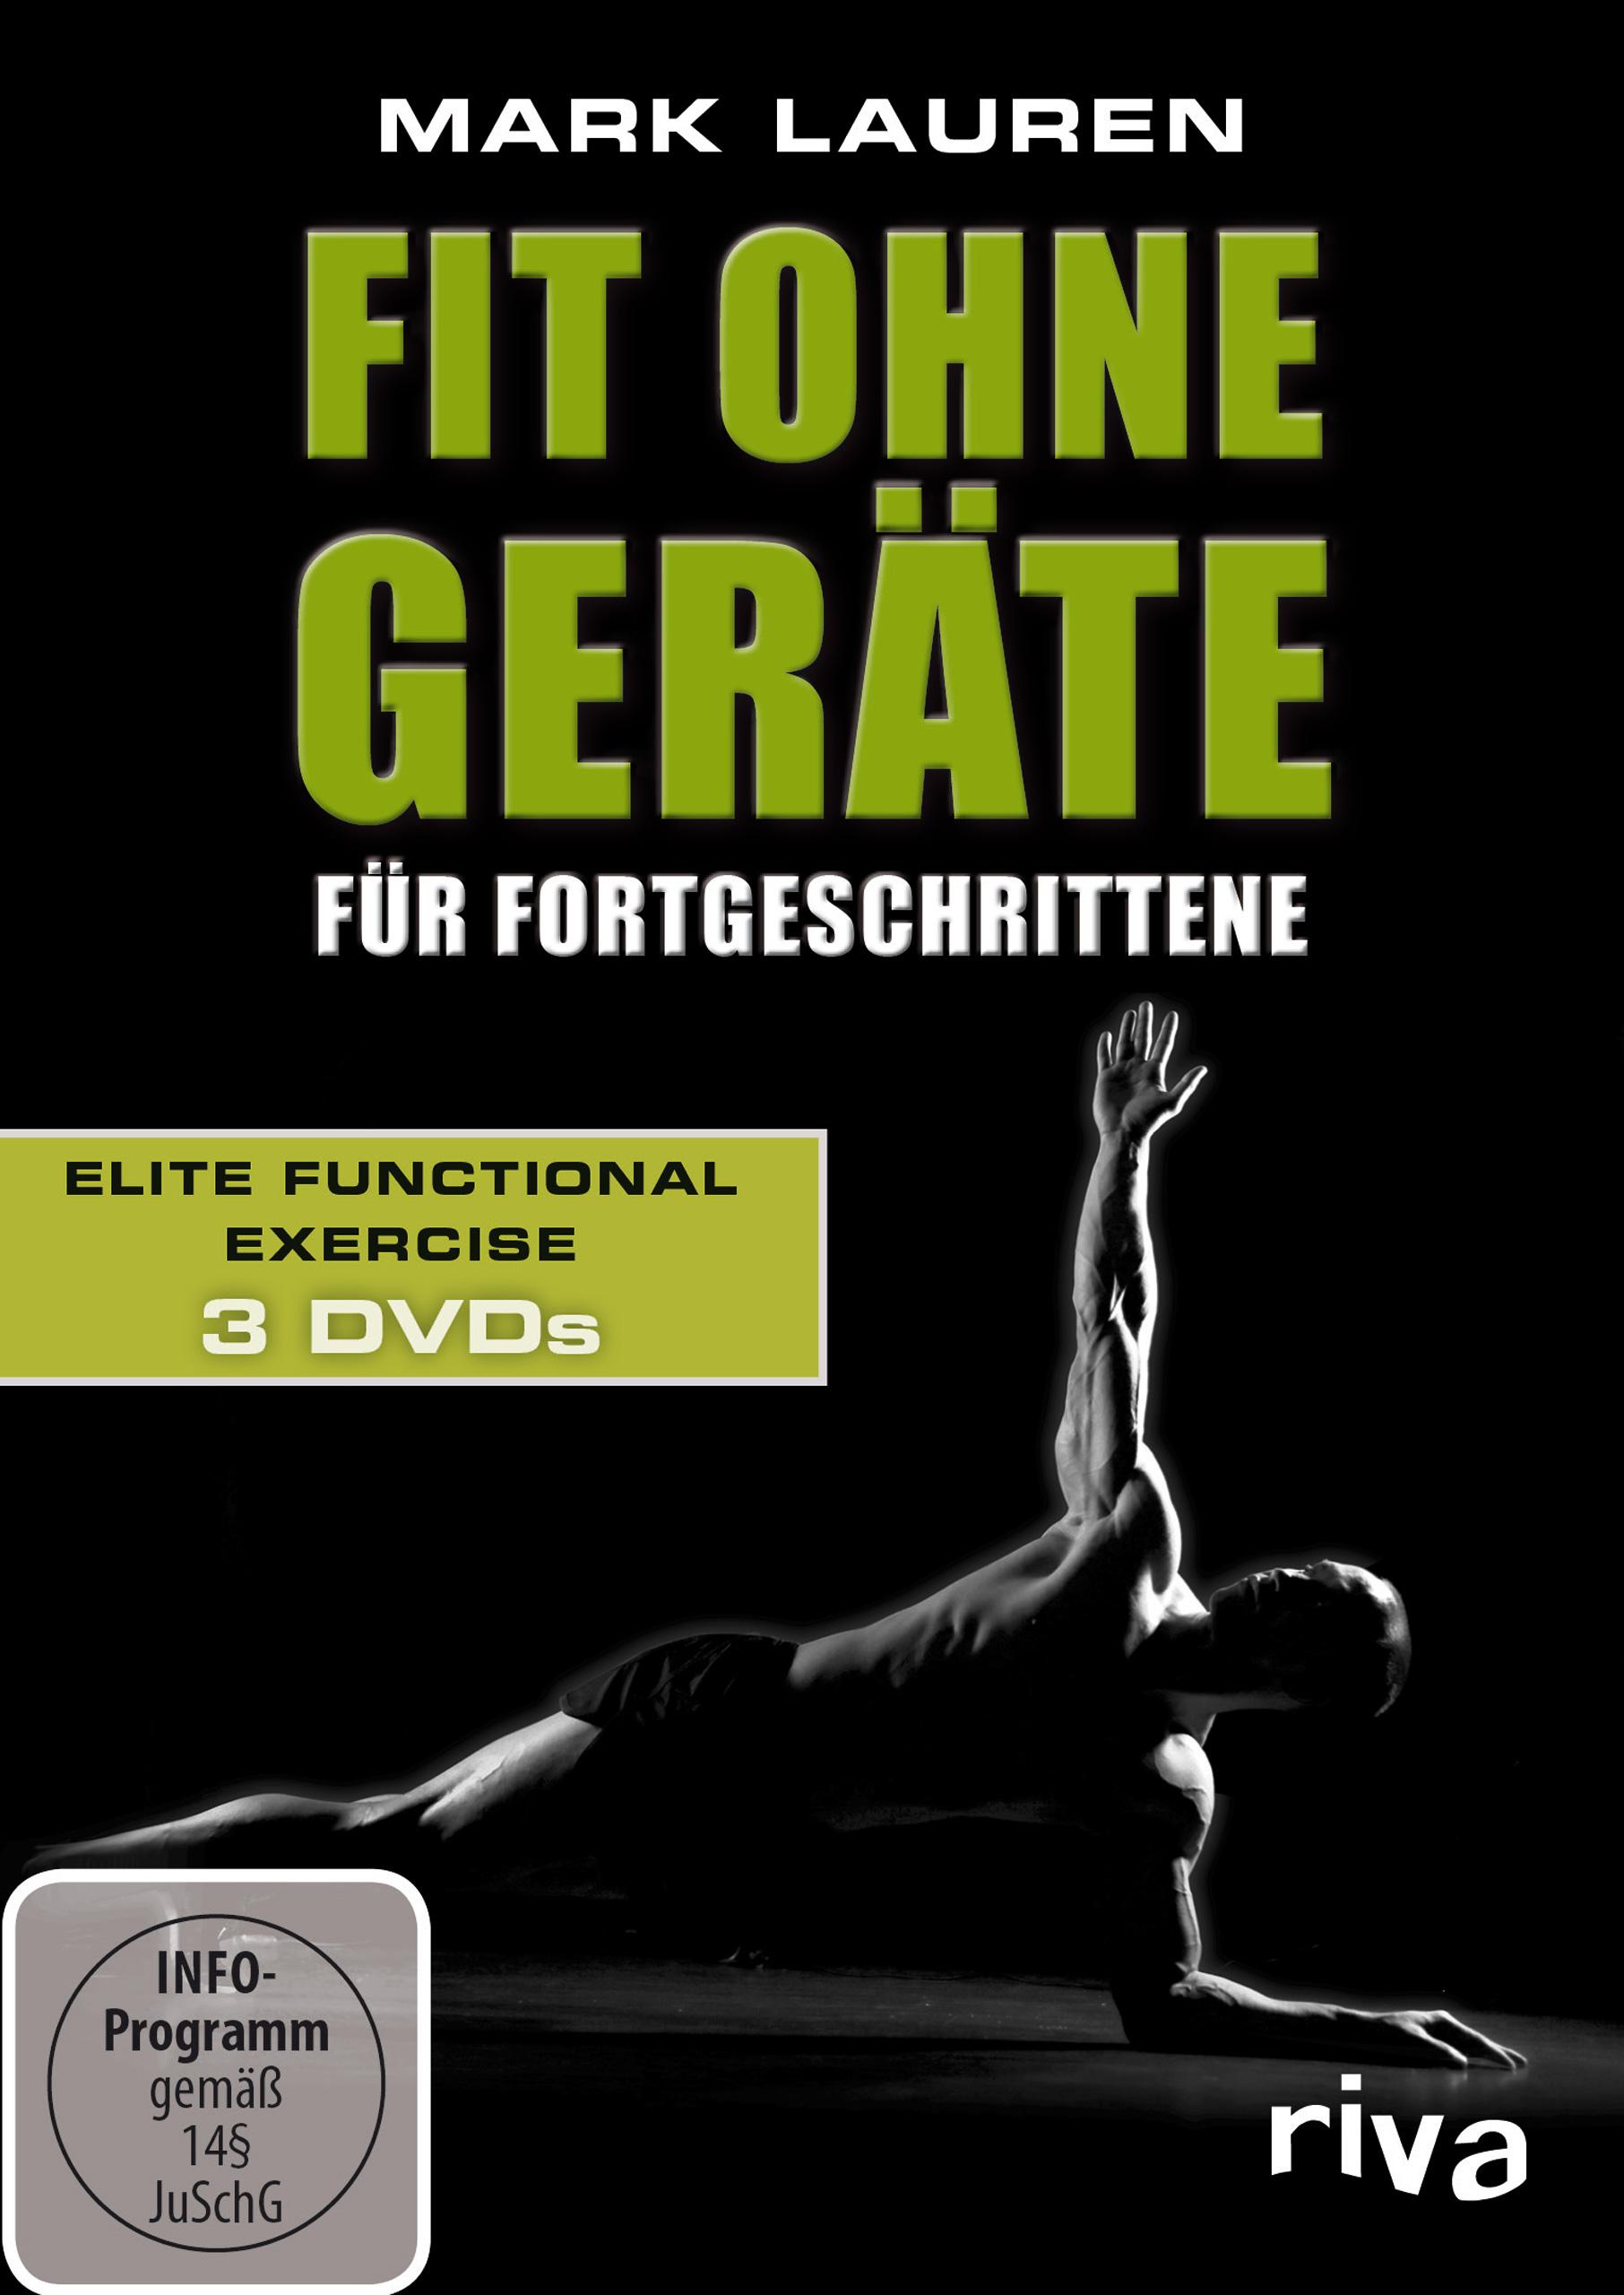 Mark Lauren - Fit ohne Geräte für Fortgeschrittene: Elite Functional Exercise [3 DVDs] - Mark Lauren